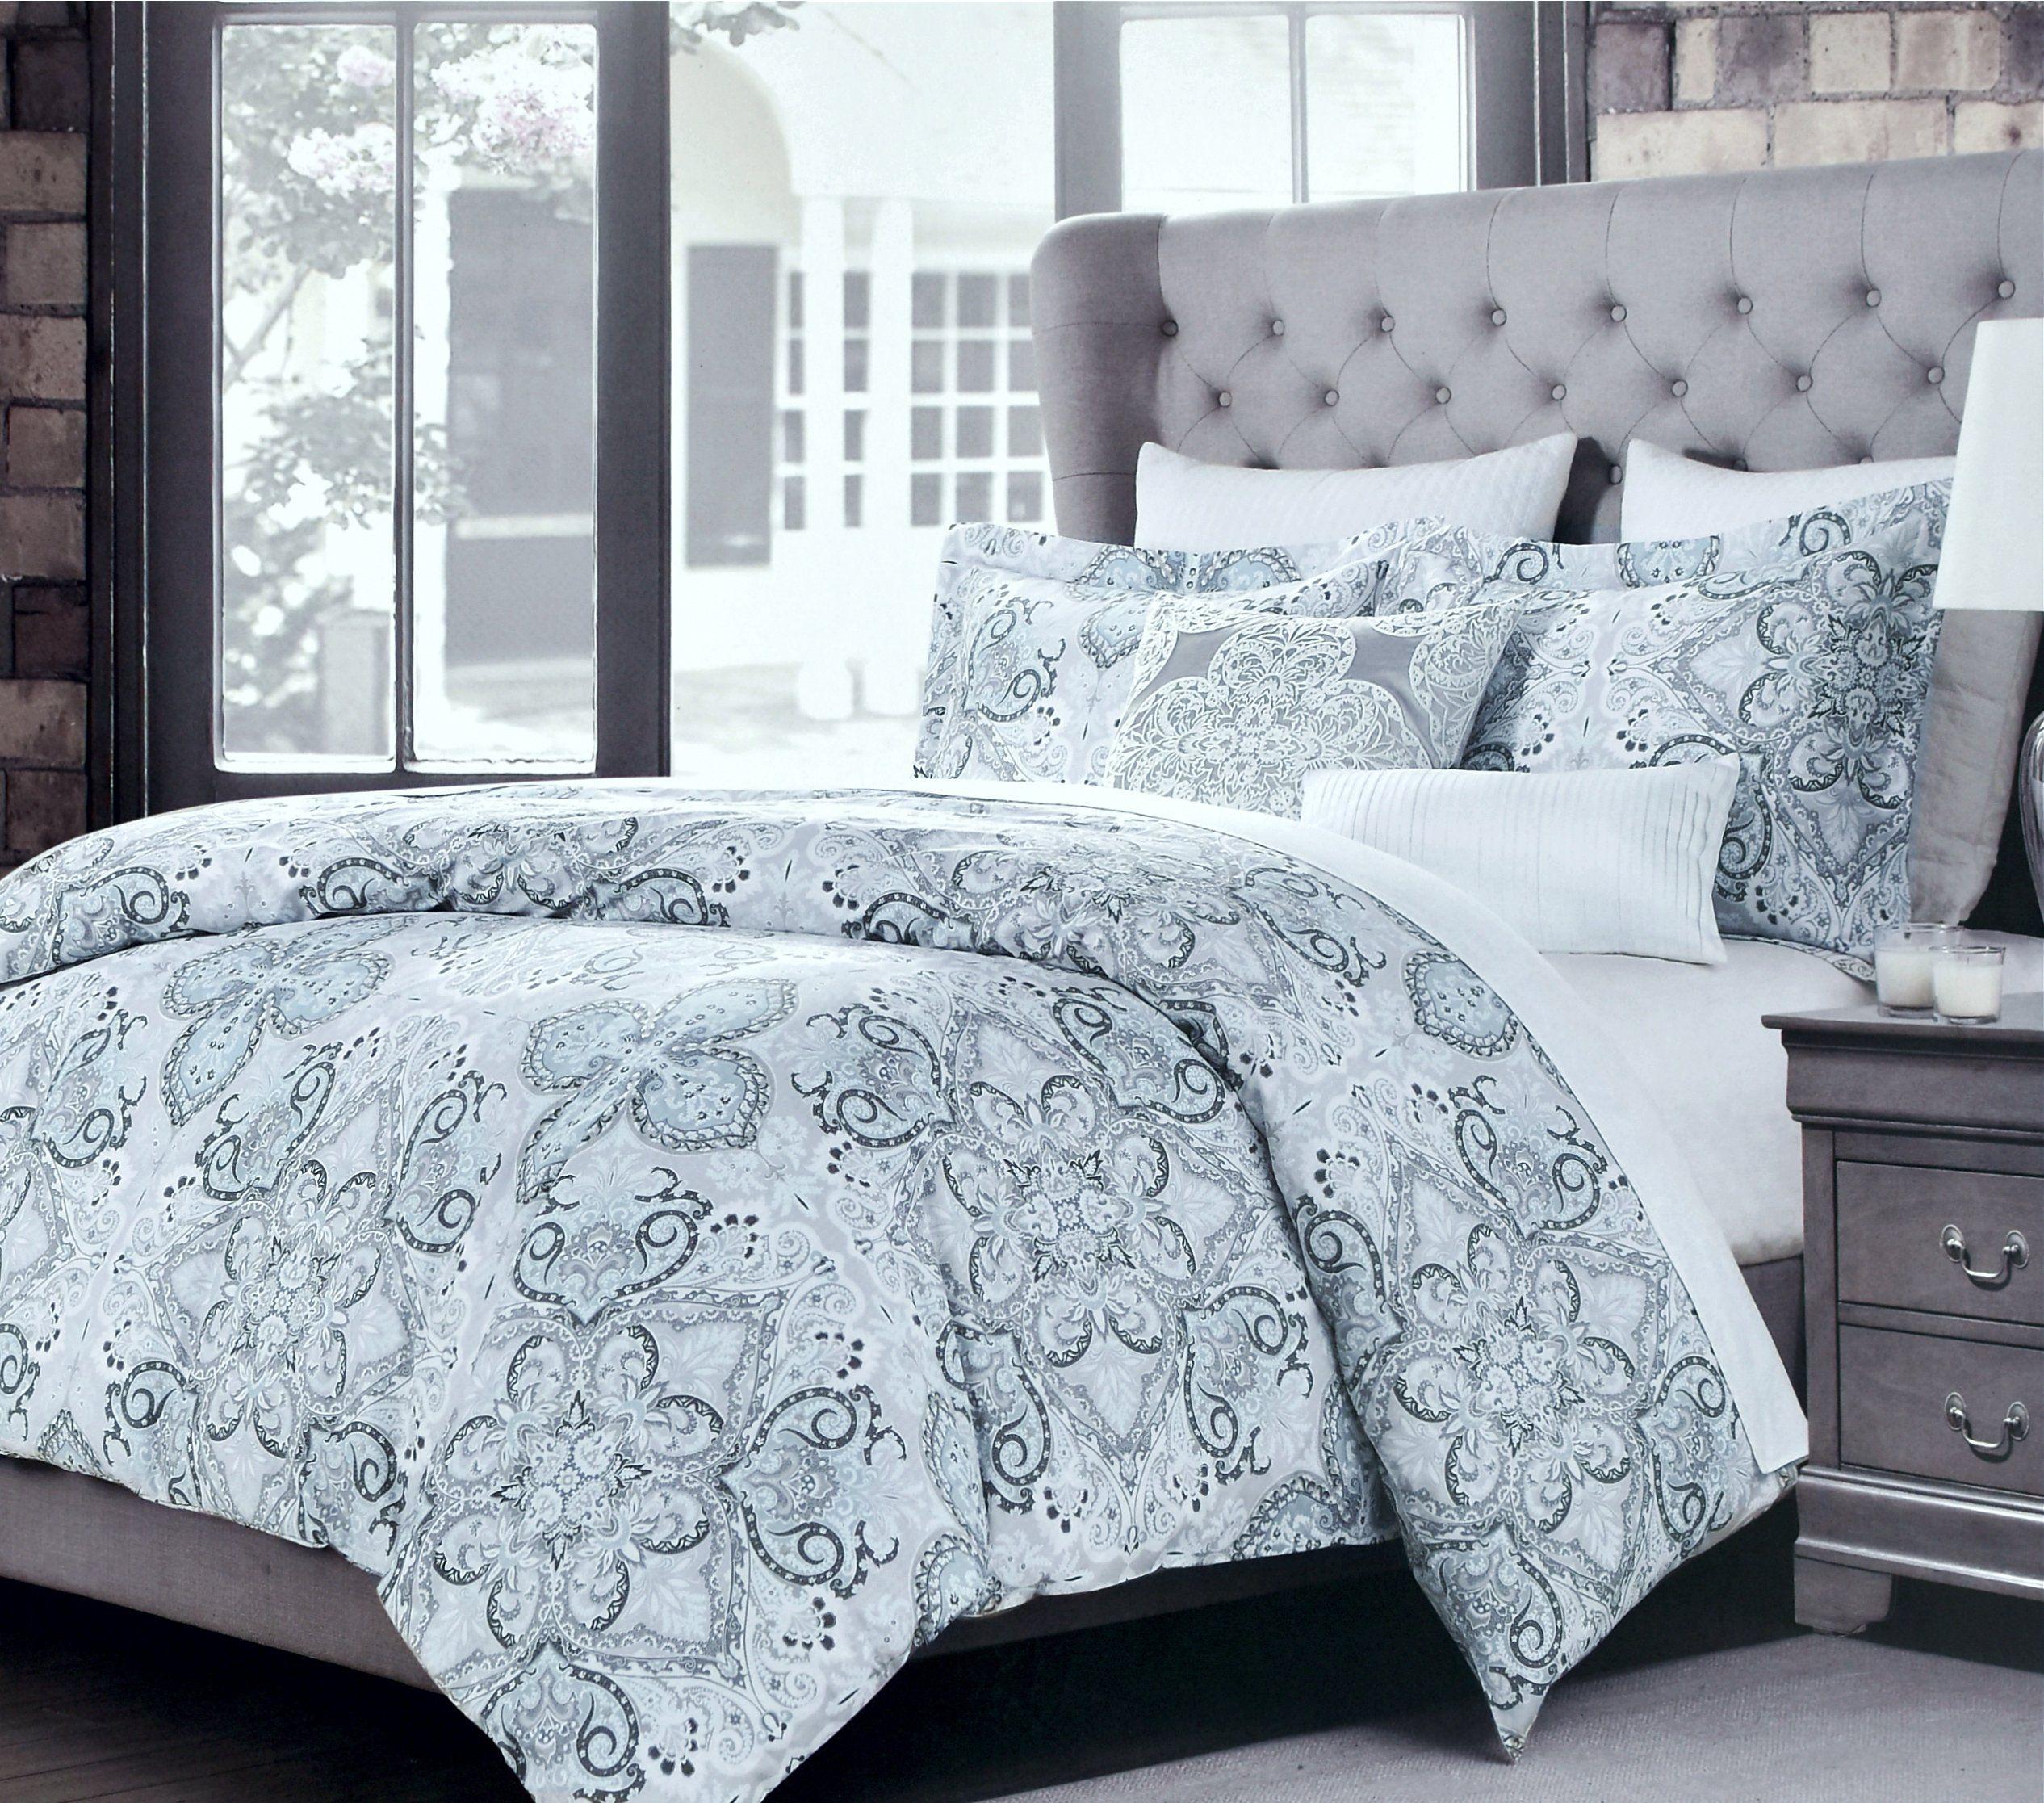 Tahari Bedding Stunning Bedroom Tahari Home Sheets